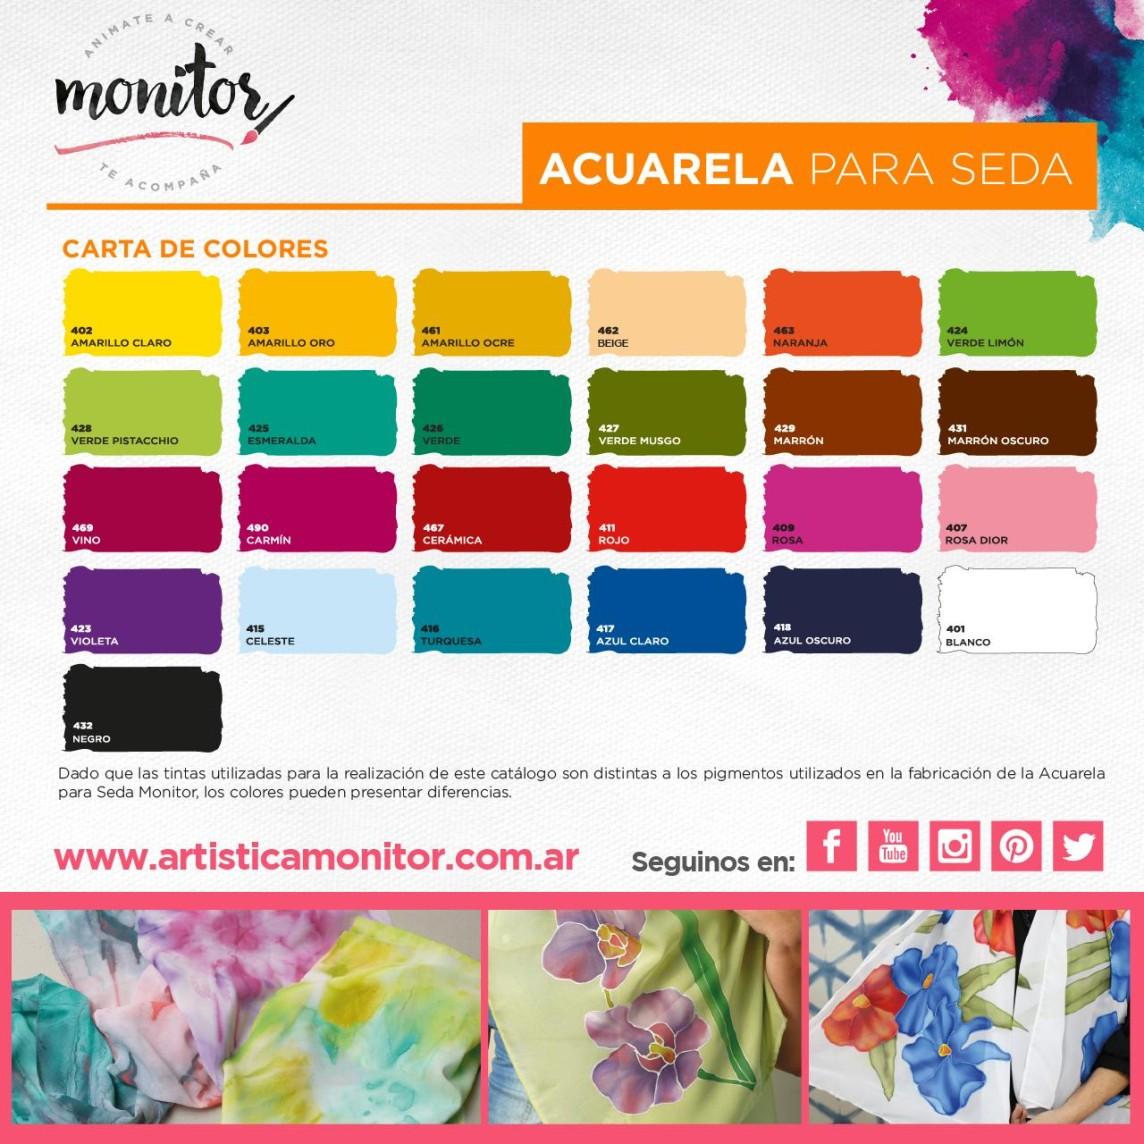 Carta de colores para Acuarela para Seda